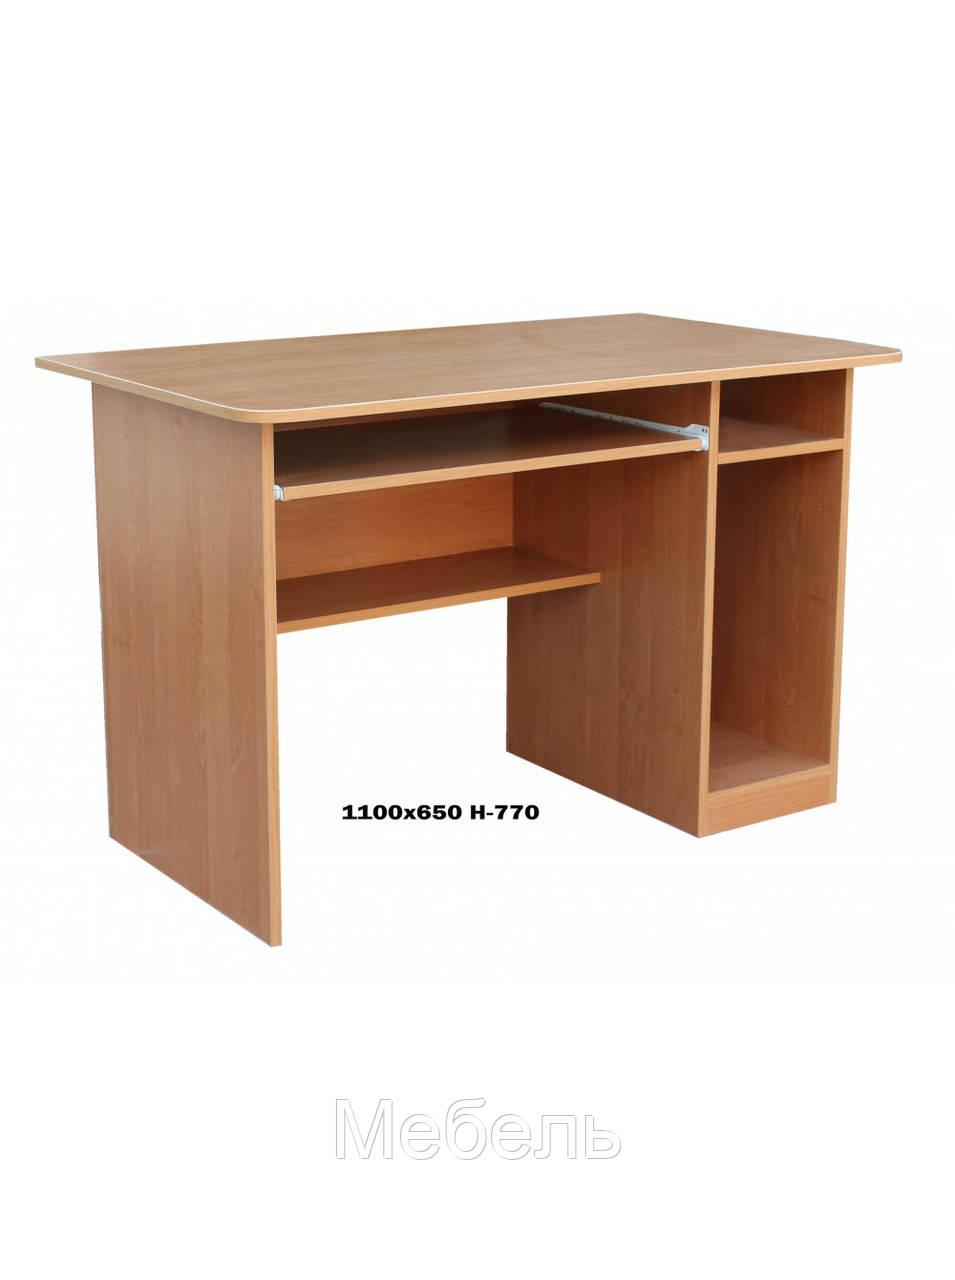 Стол компьютерный СК 2  Евростандарт 1100*650*770